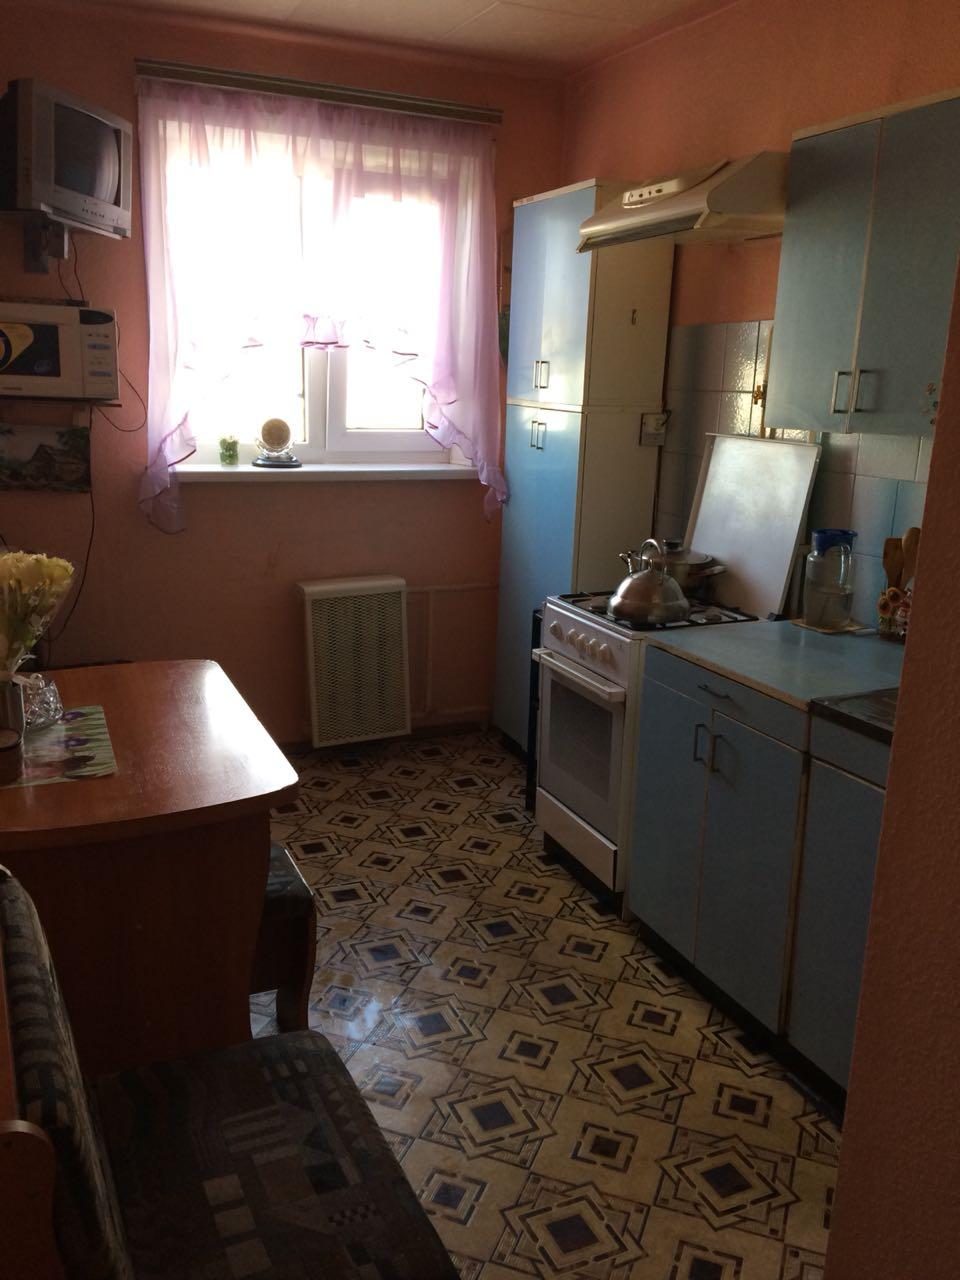 Екатеринбург — 2-комн. квартира, 47 м² – Белинского, 154 (47 м²) — Фото 1